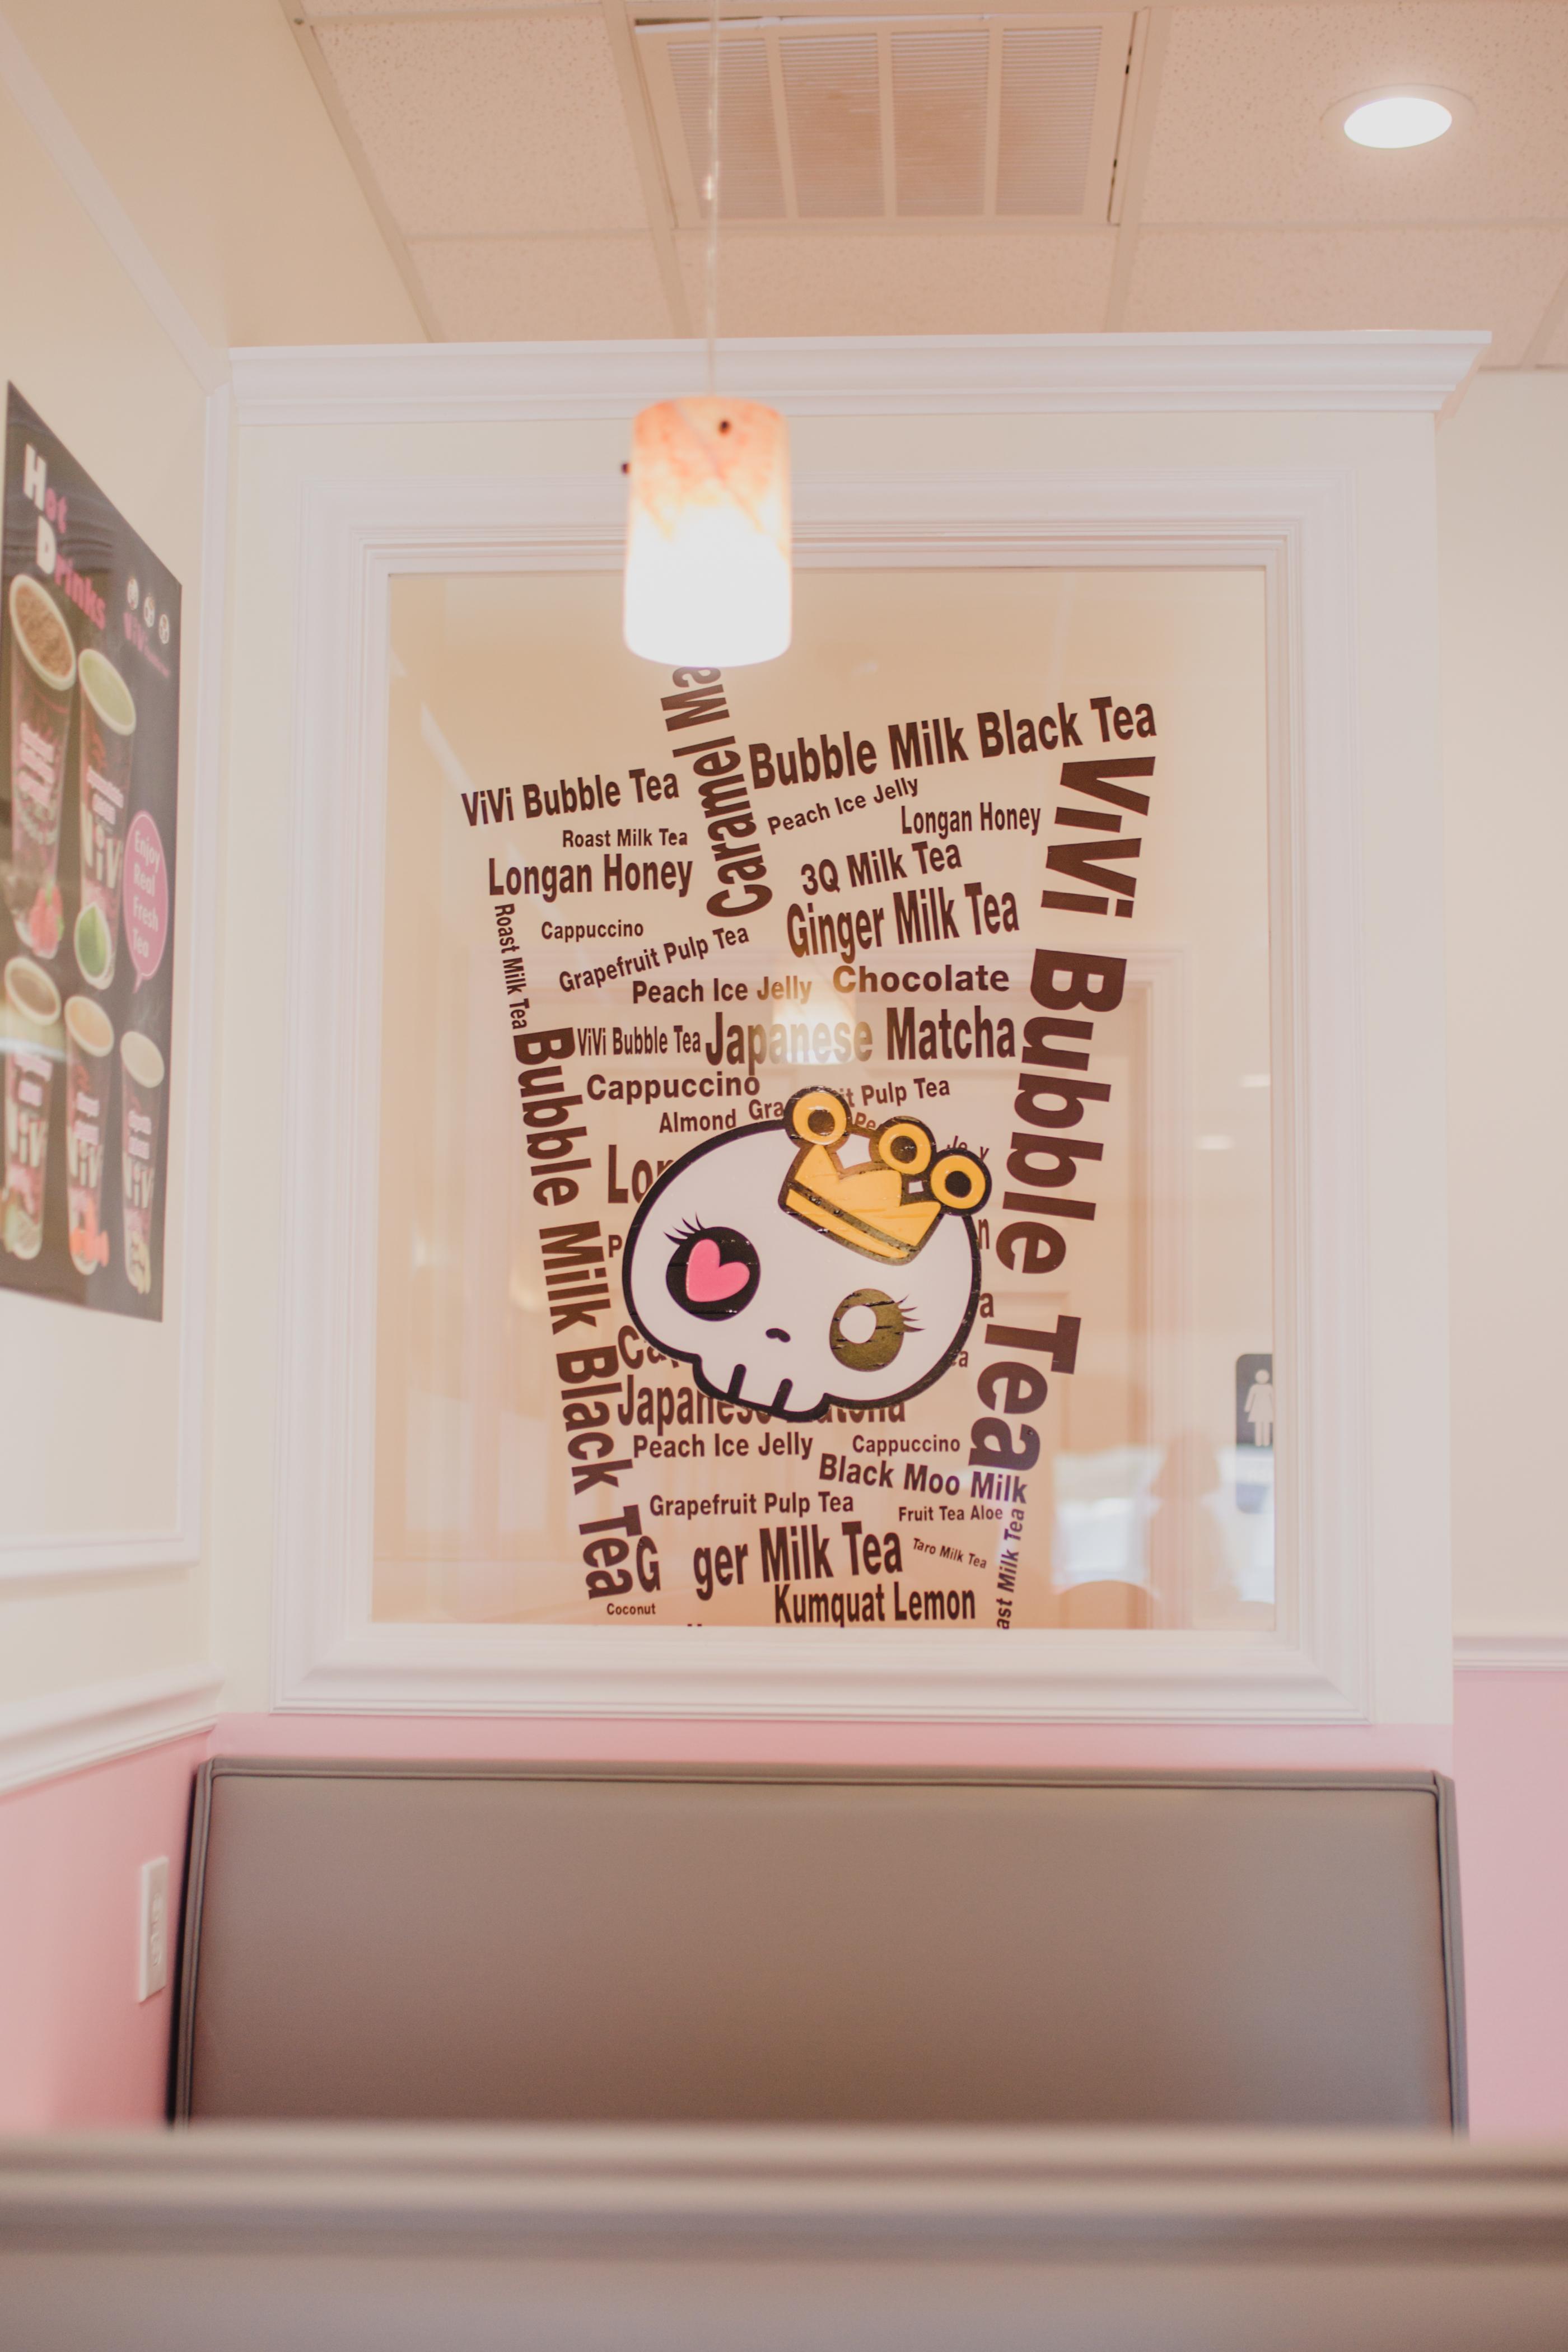 New York S Vivi Bubble Tea Brings Unique Drinks And Spicy Popcorn Chicken To Baton Rouge